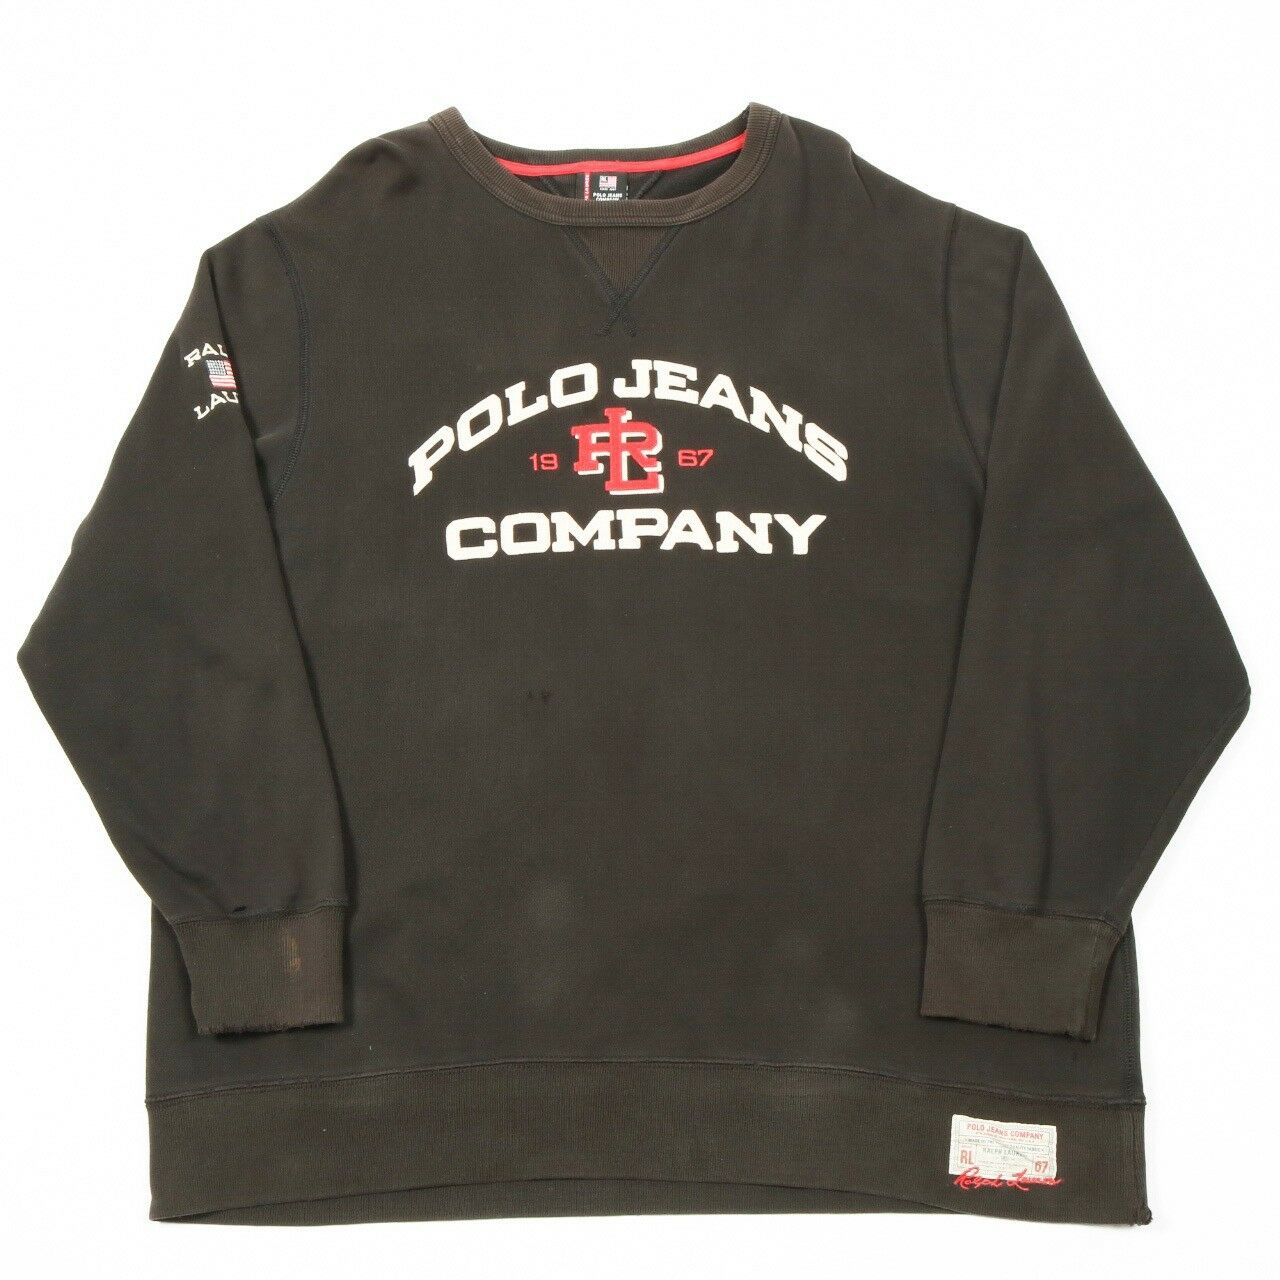 90s Vintage POLO by RALPH LAUREN Spell Out Sweatshirt |  Herren XL | Retro Sweat